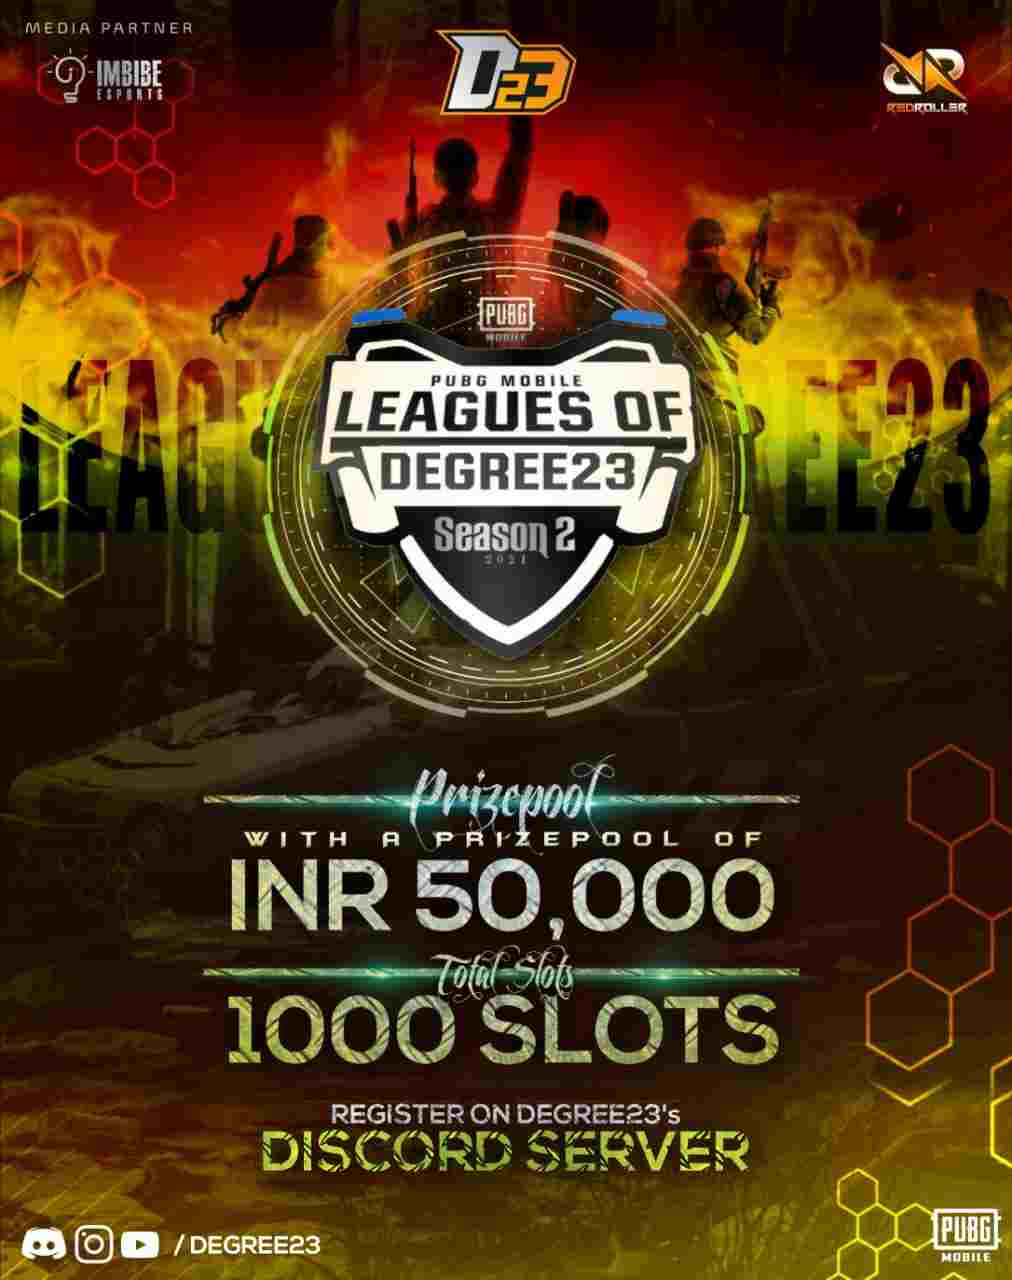 PUBG Mobile League Season 2 Organized by Degree23